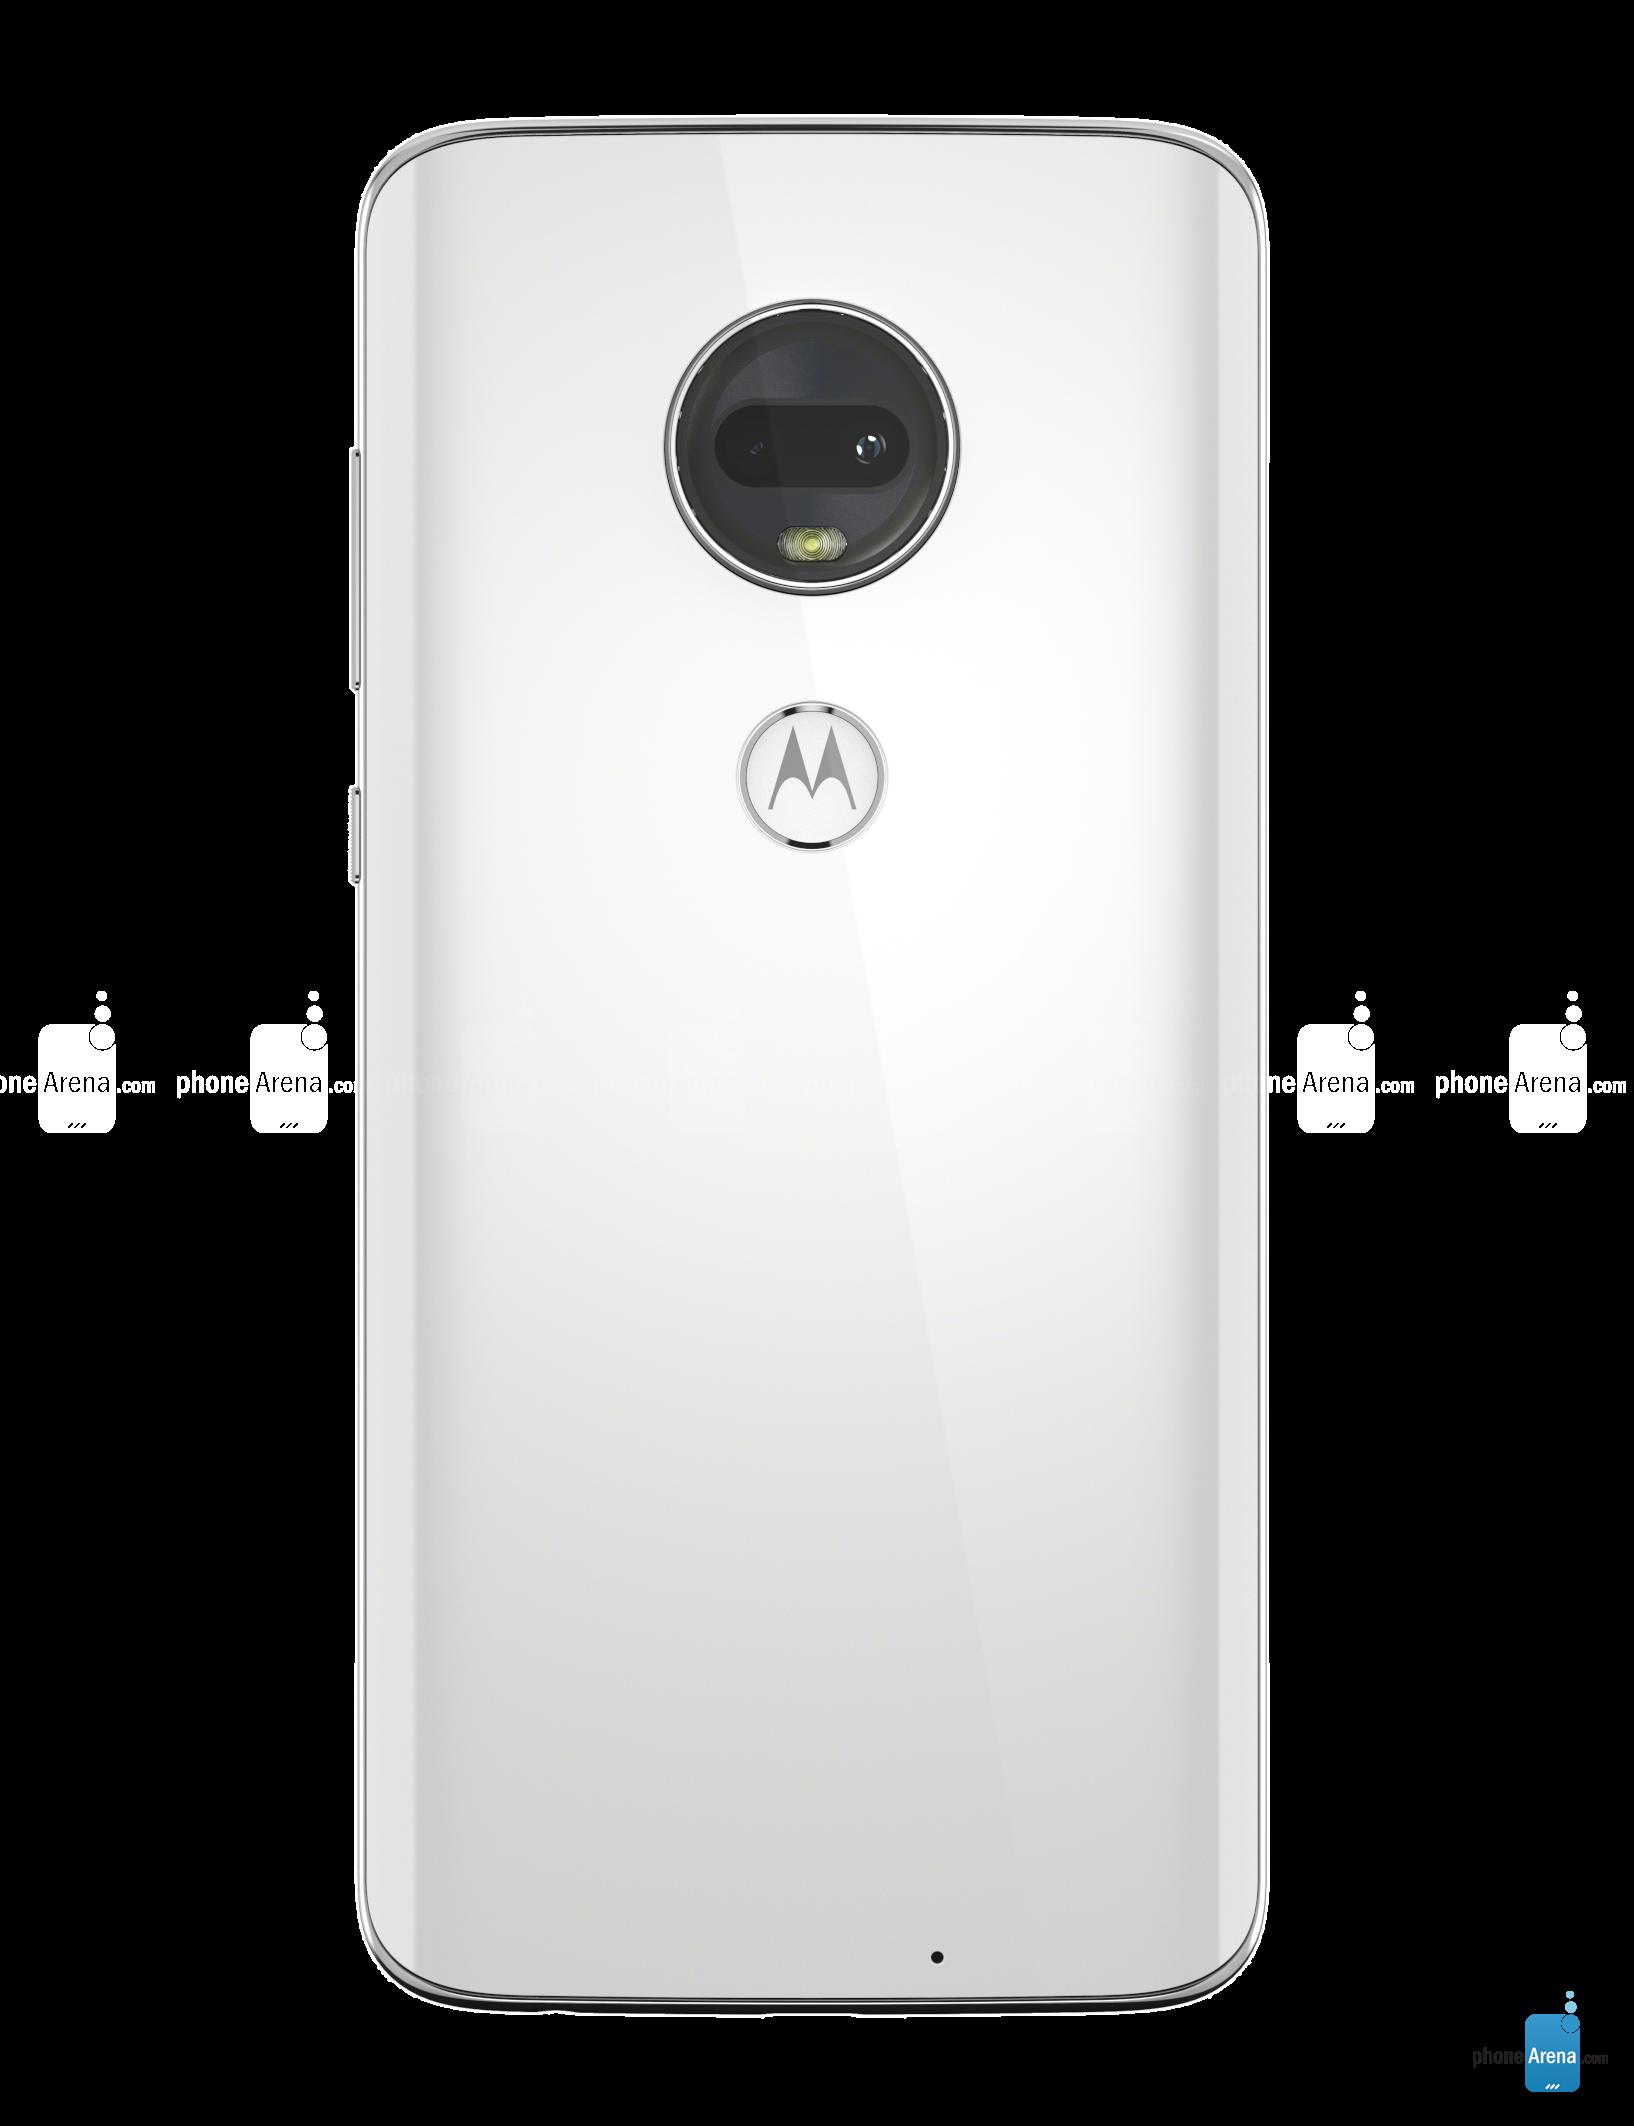 موتورولا موتو جی 7 (Motorola Moto G7)